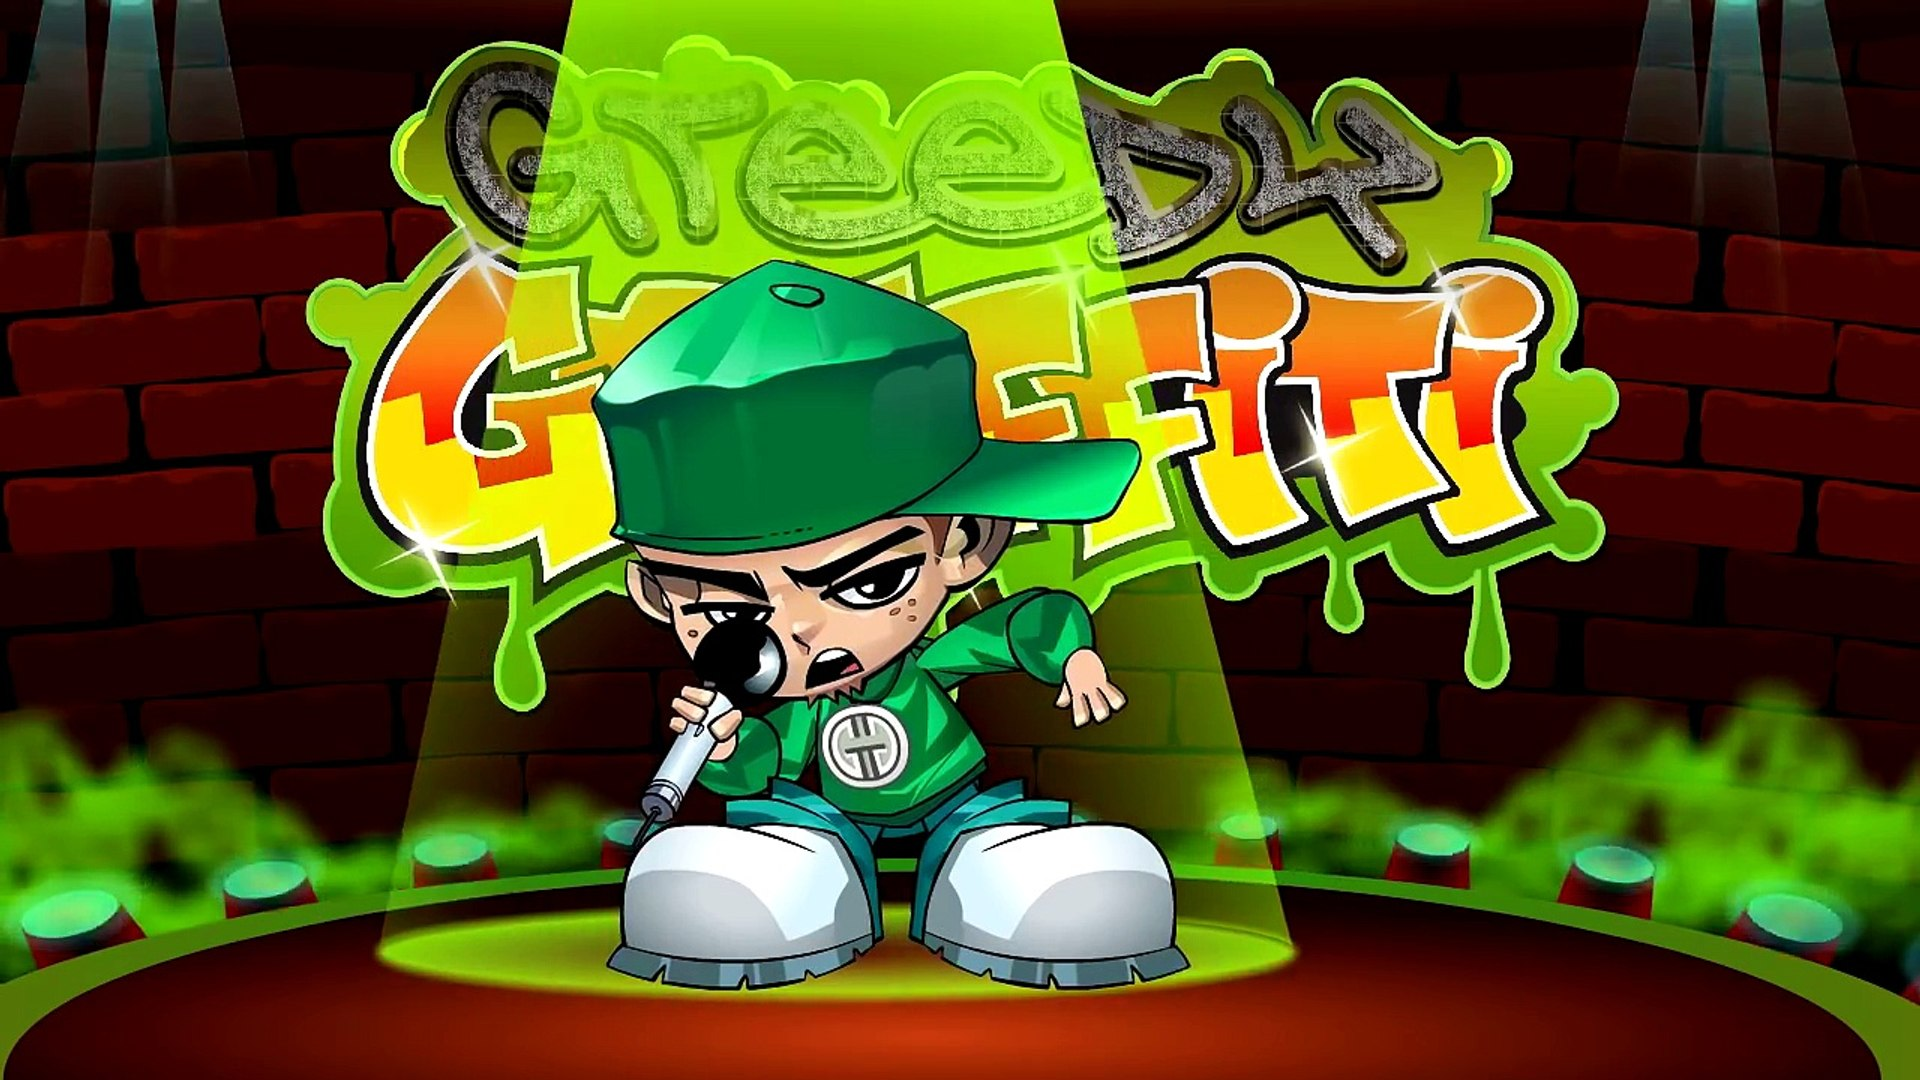 Funny Rap - MUFFIN TOPS - hiphop comedy music video parody by cartoon gangsta rapper Greedy Graffit